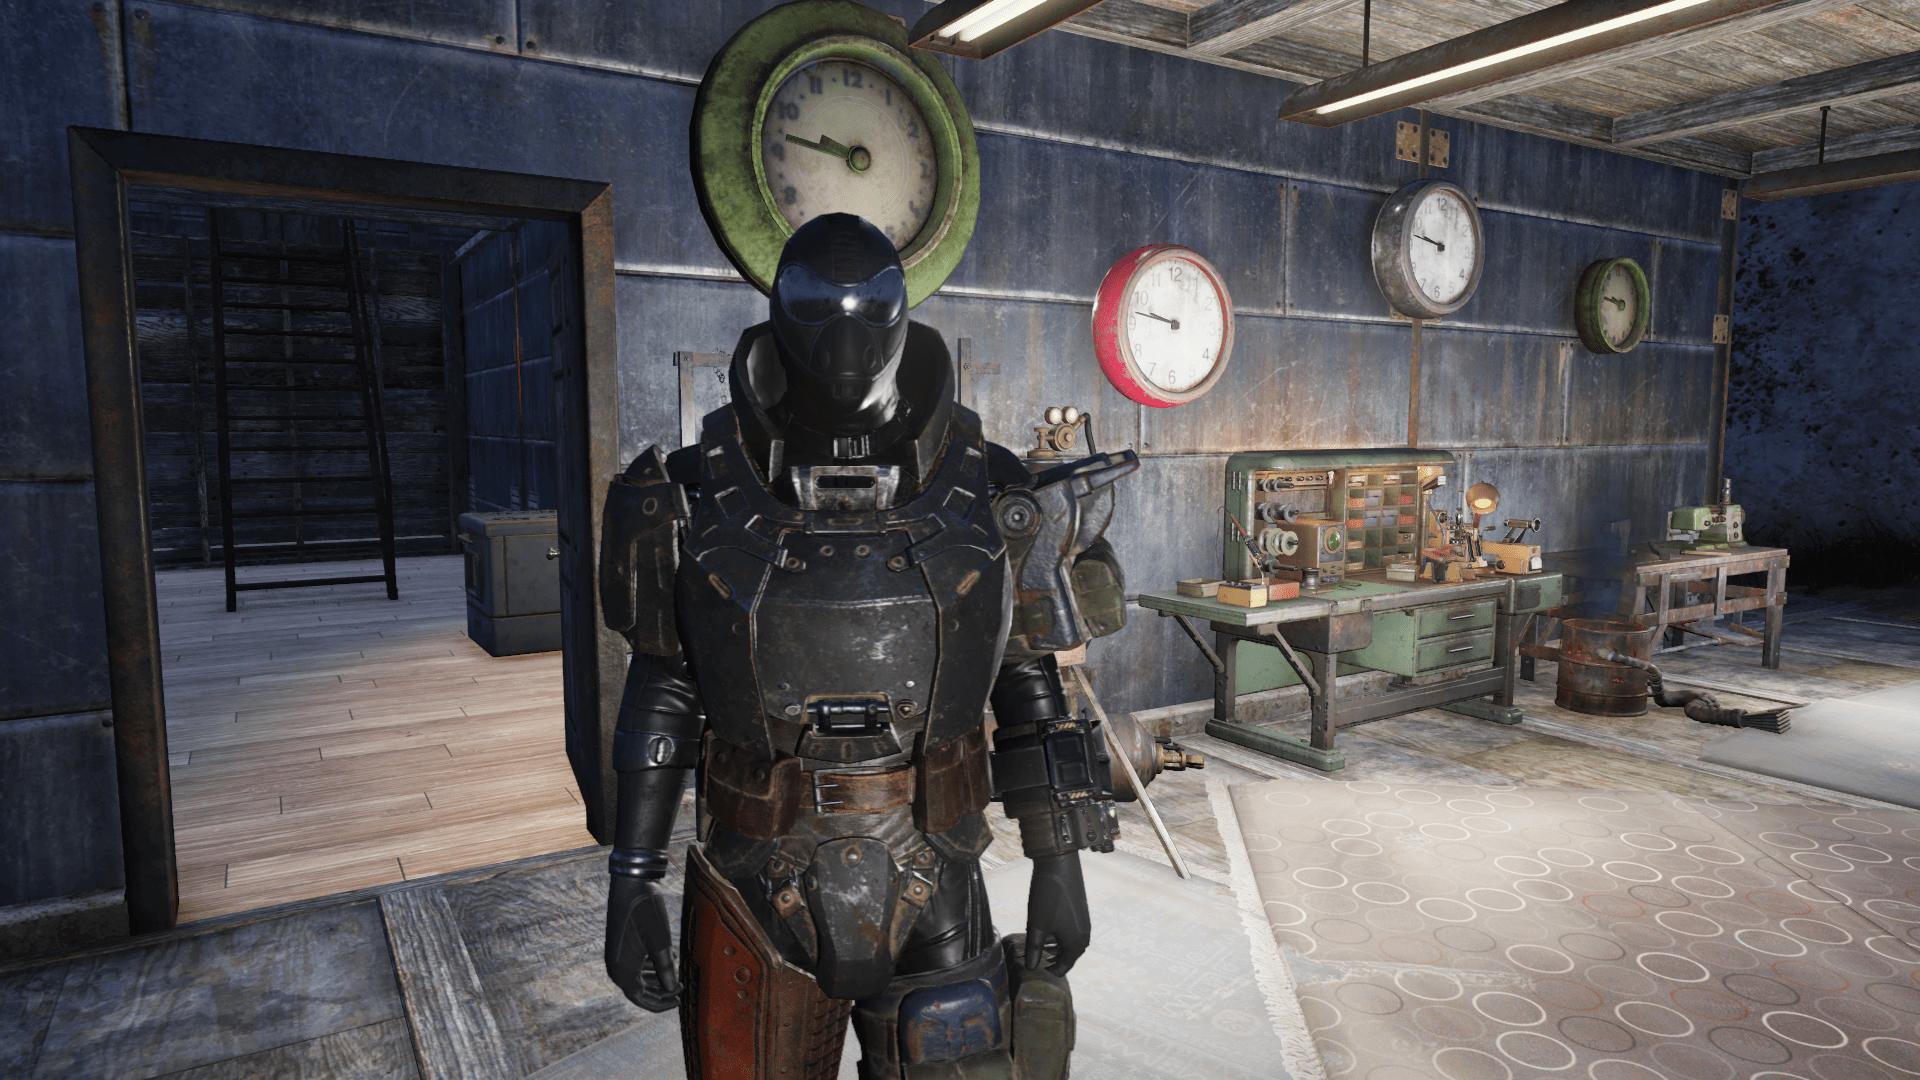 No Combat Armor Star - Fallout 76 Mod download